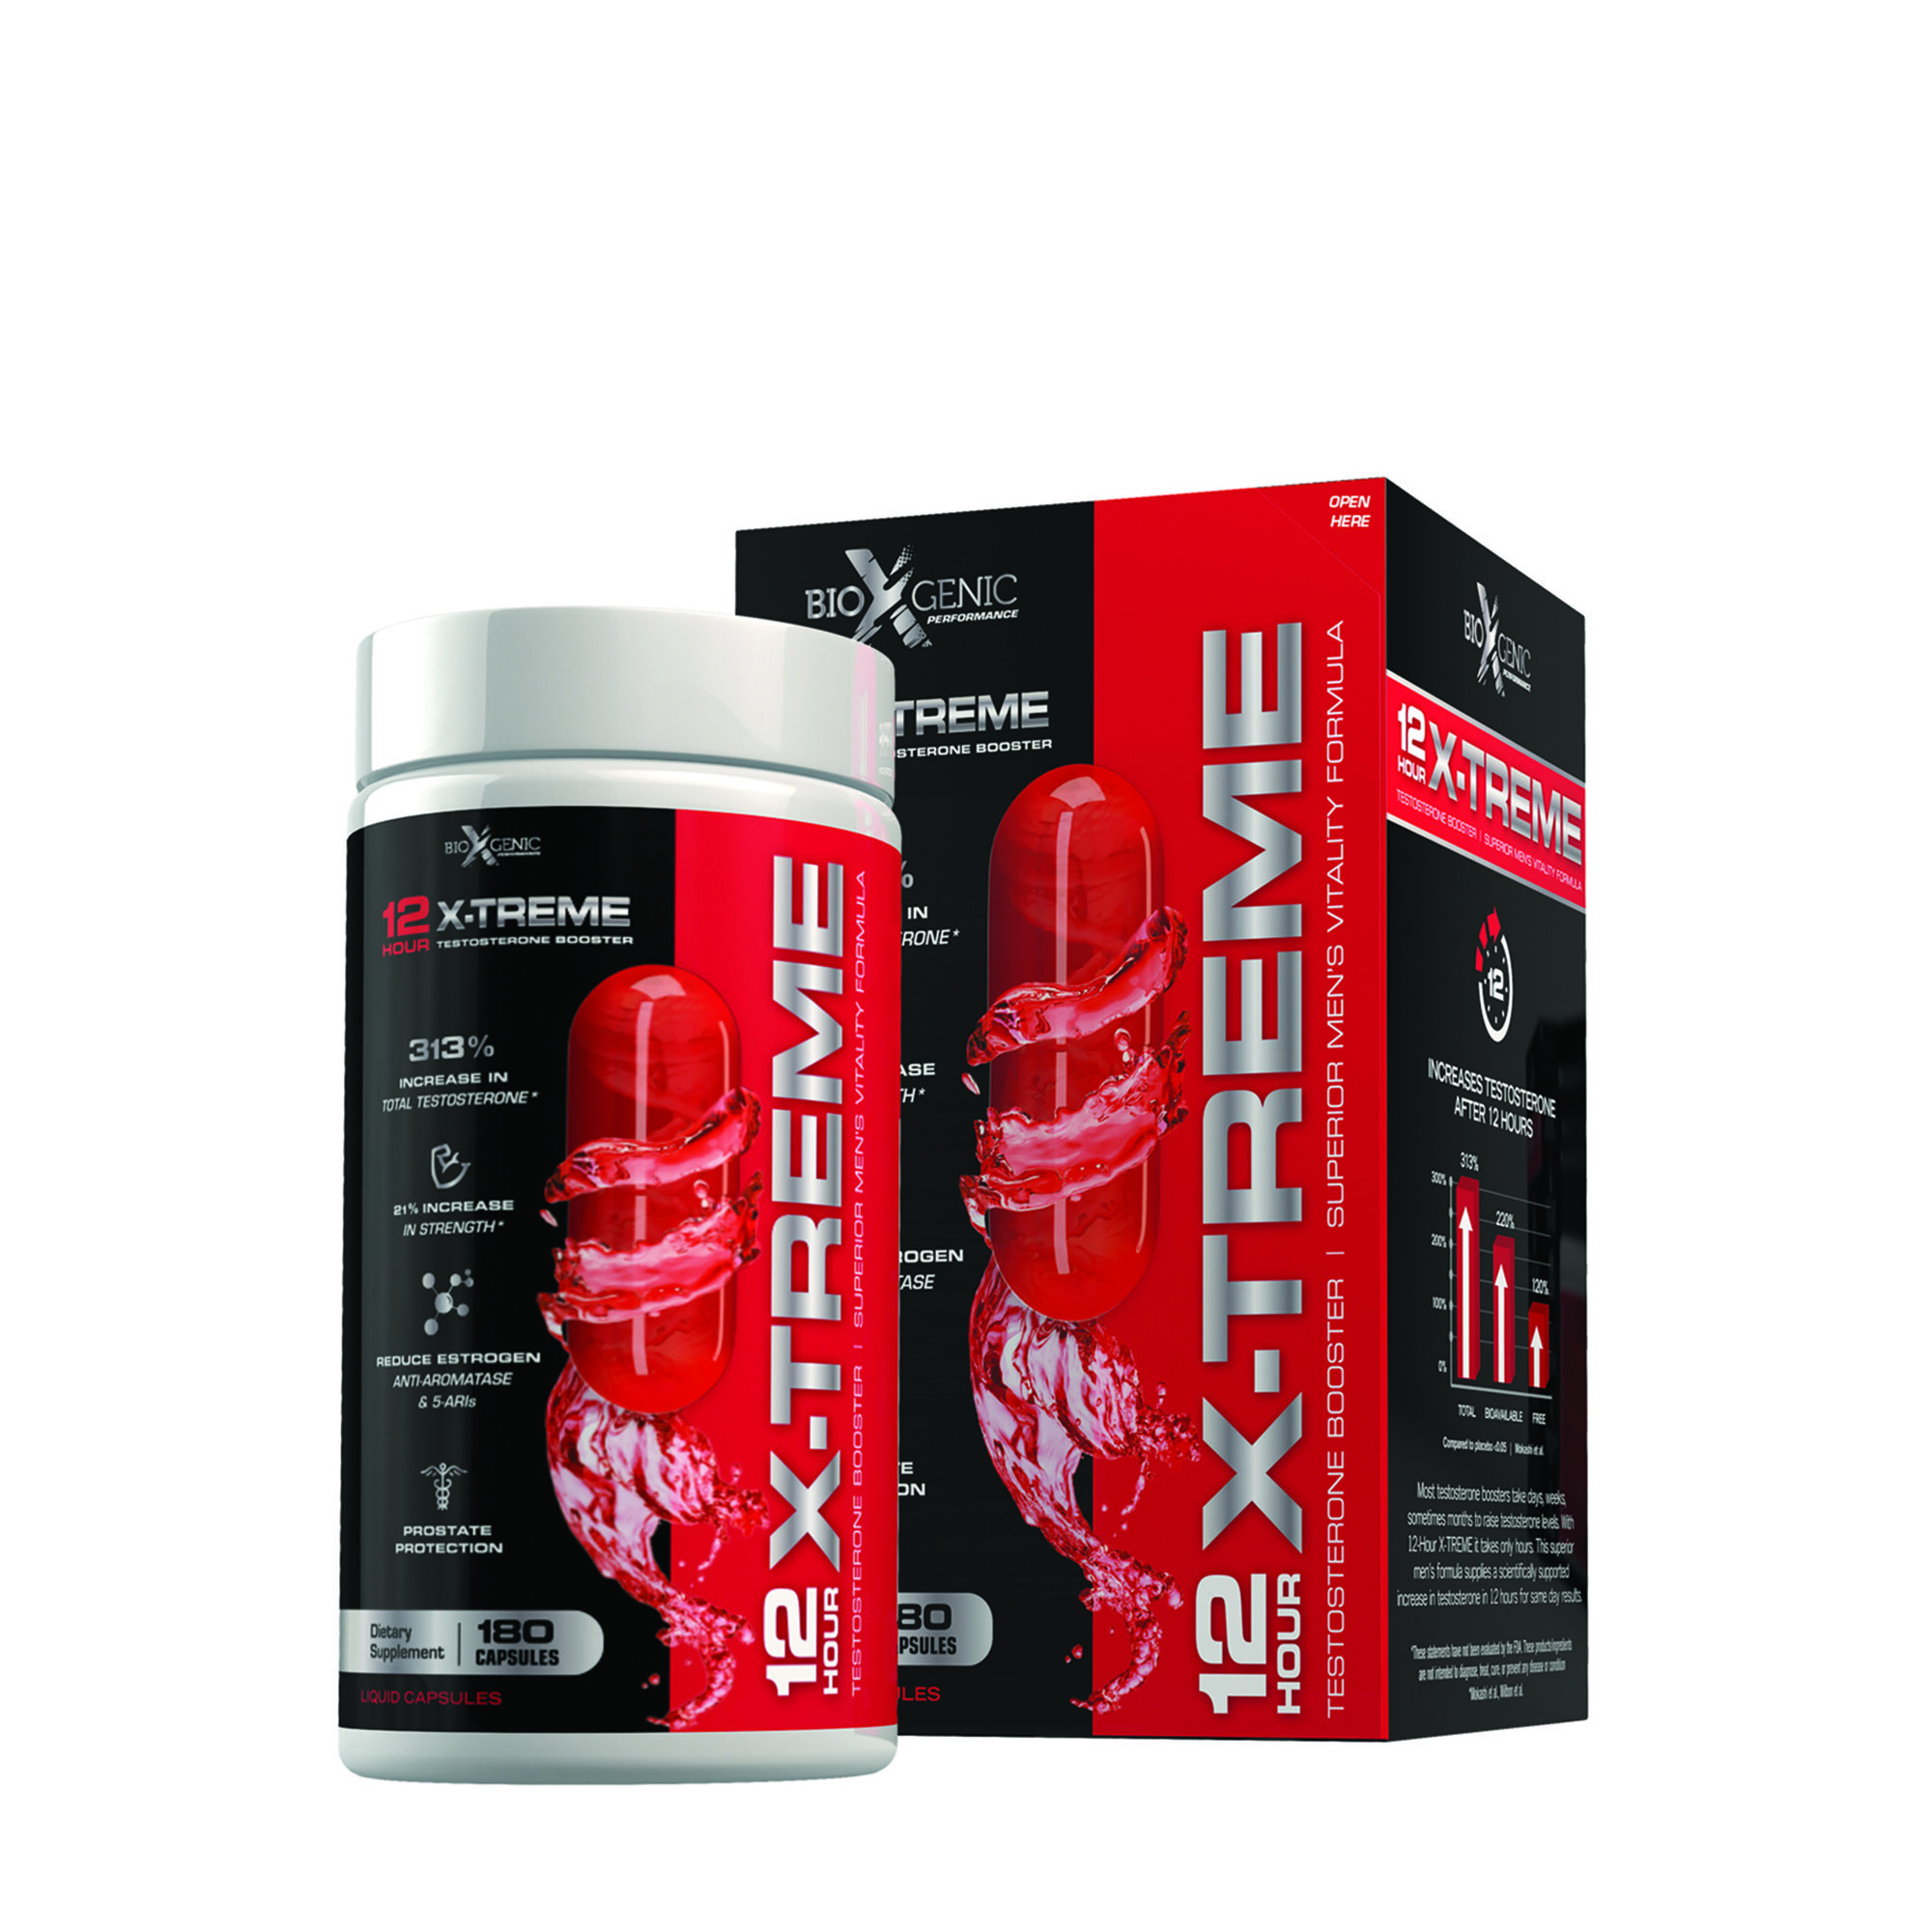 BioXgenic 12-Hour X-Treme